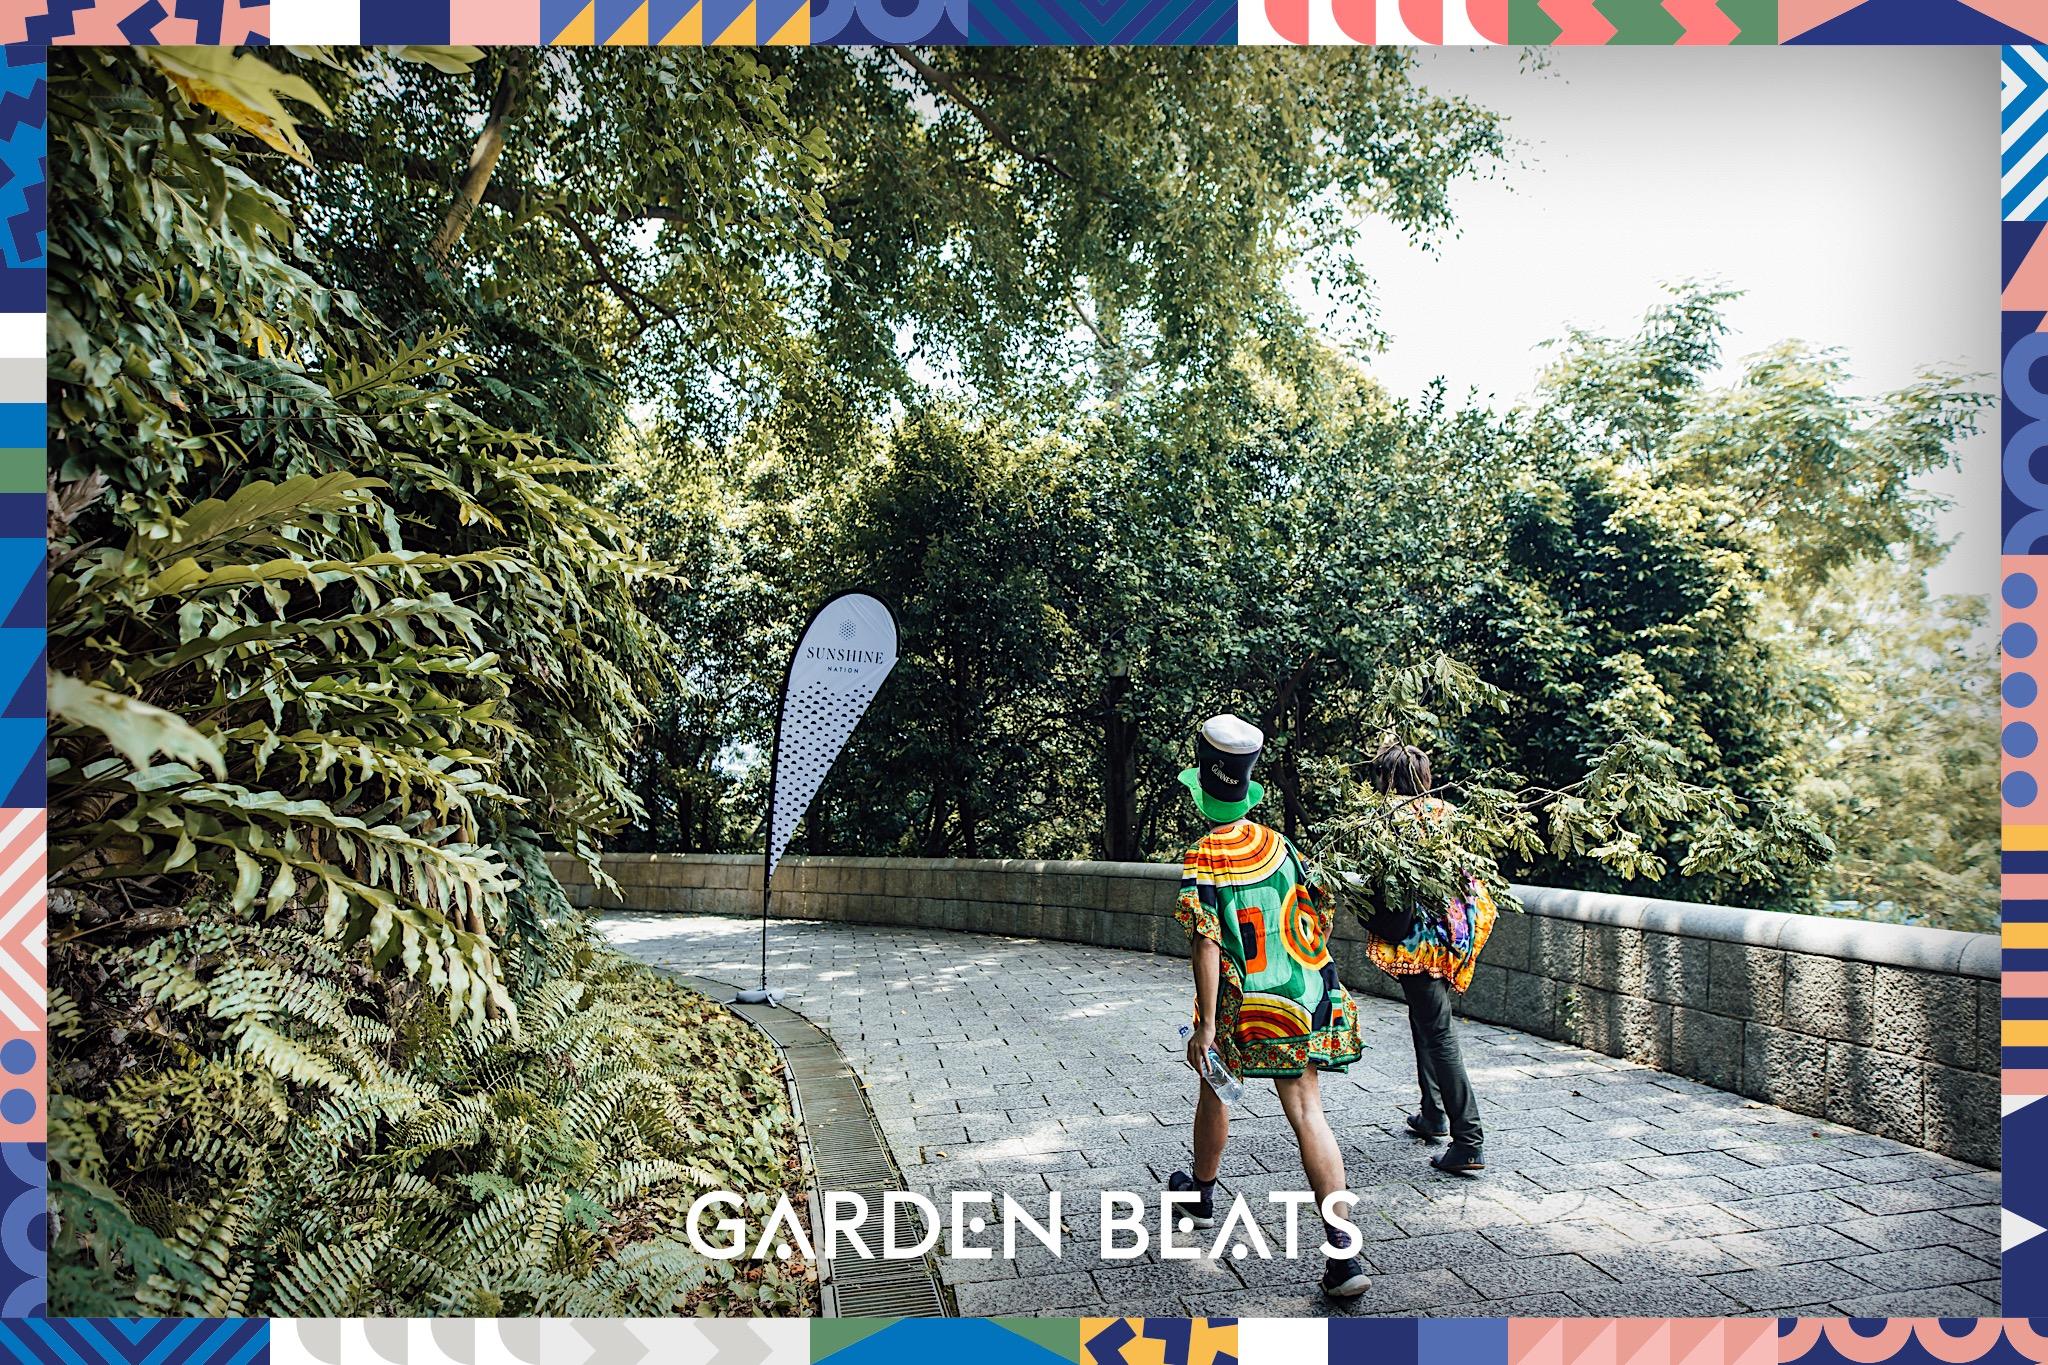 18032017_GardenBeats_Colossal115_WatermarkedGB.jpg